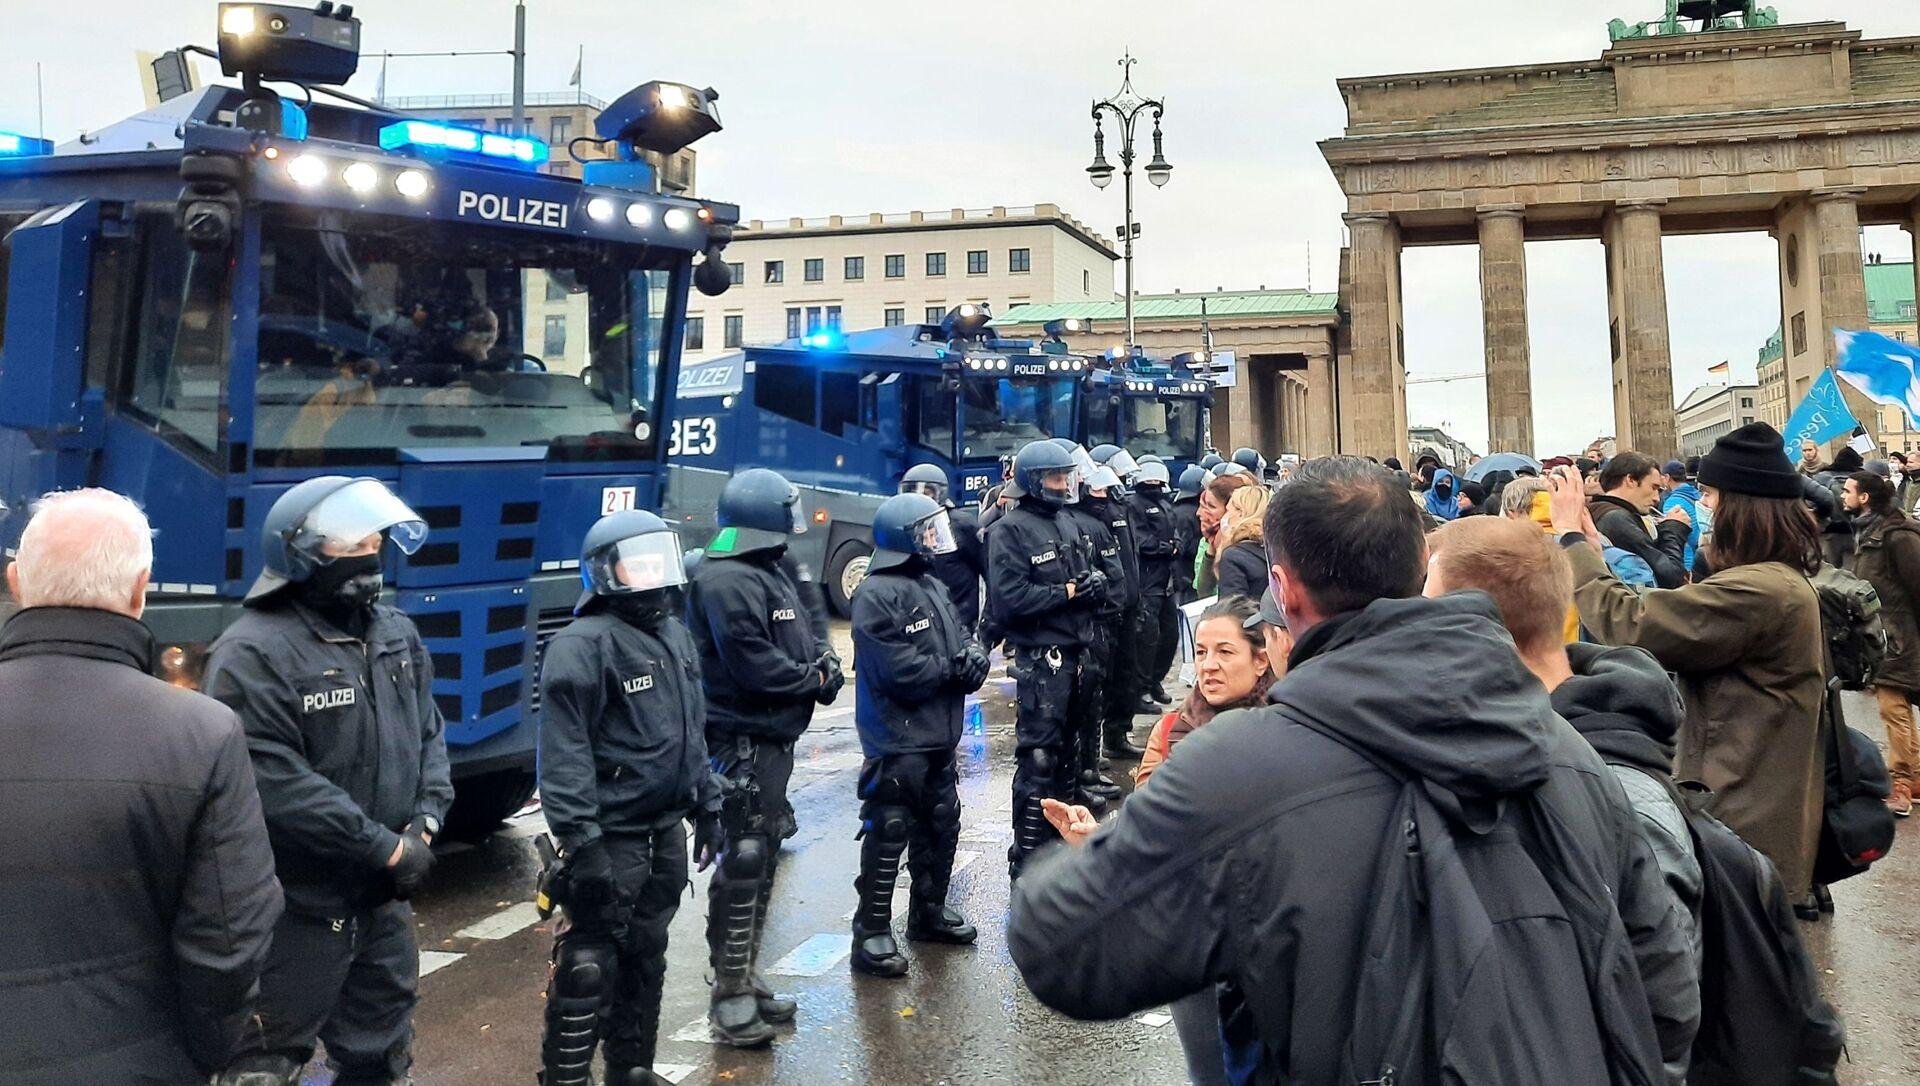 Proteste a Berlino - Sputnik Italia, 1920, 30.04.2021